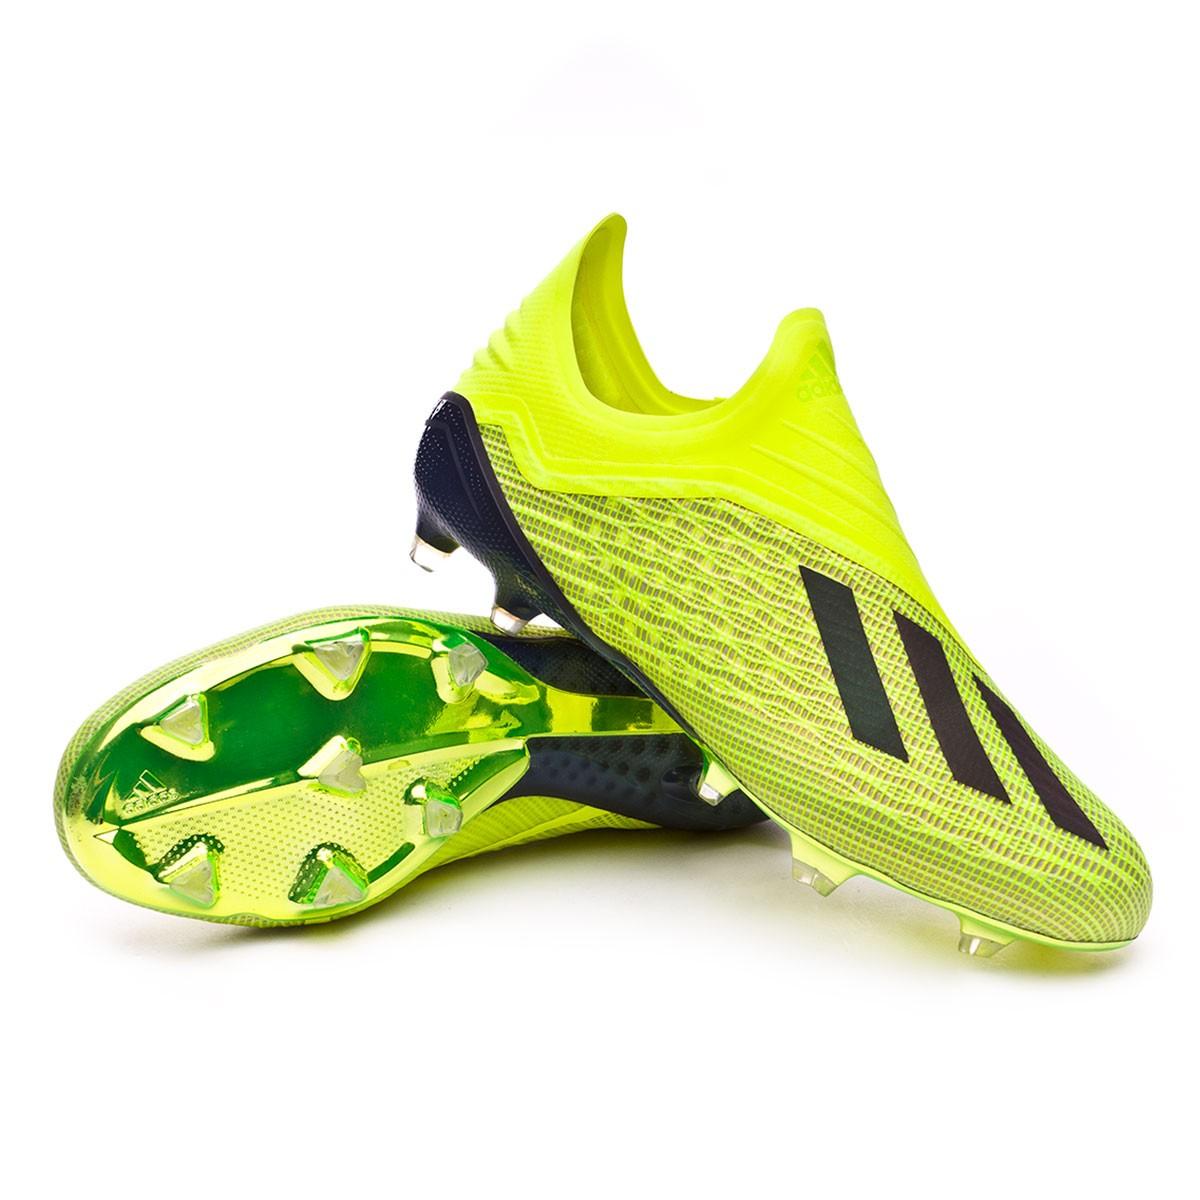 3357f9e4c30cb Bota de fútbol adidas X 18+ FG Solar yellow-Core black-White - Tienda de  fútbol Fútbol Emotion